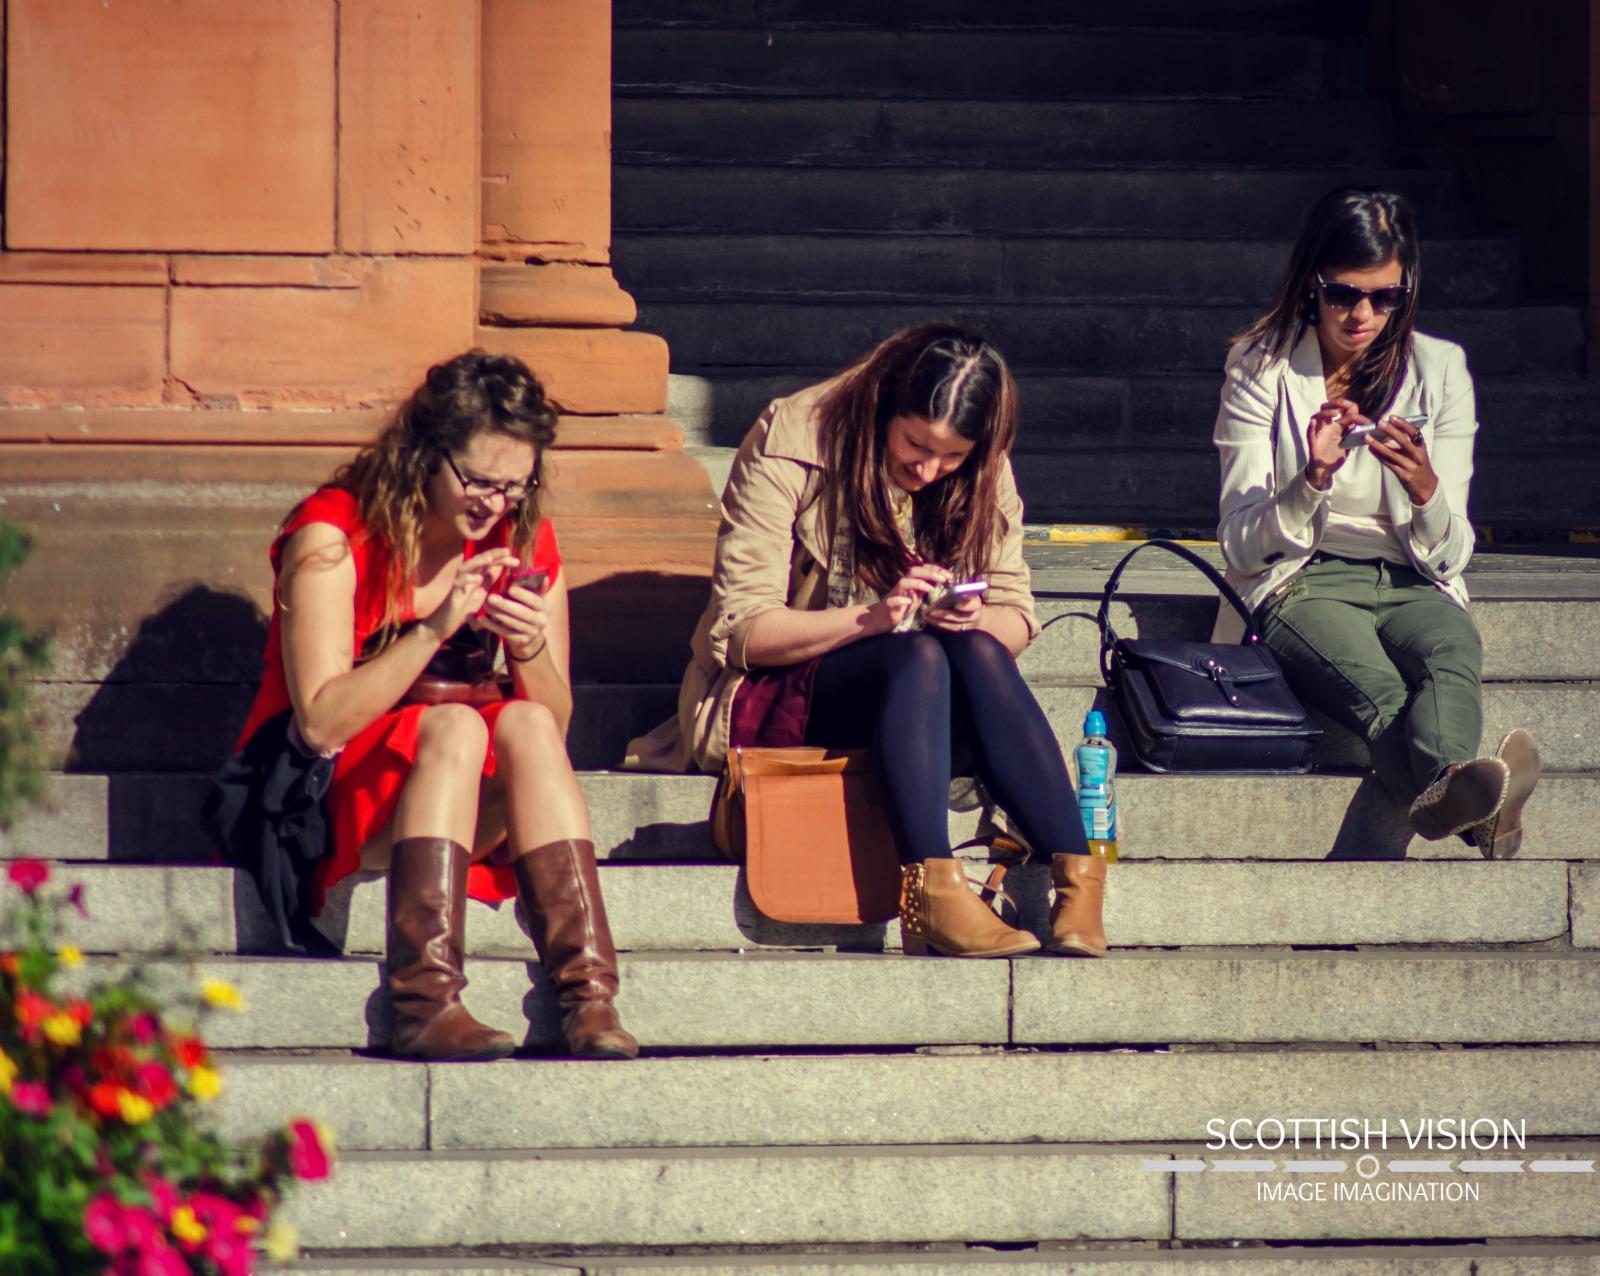 #Texting